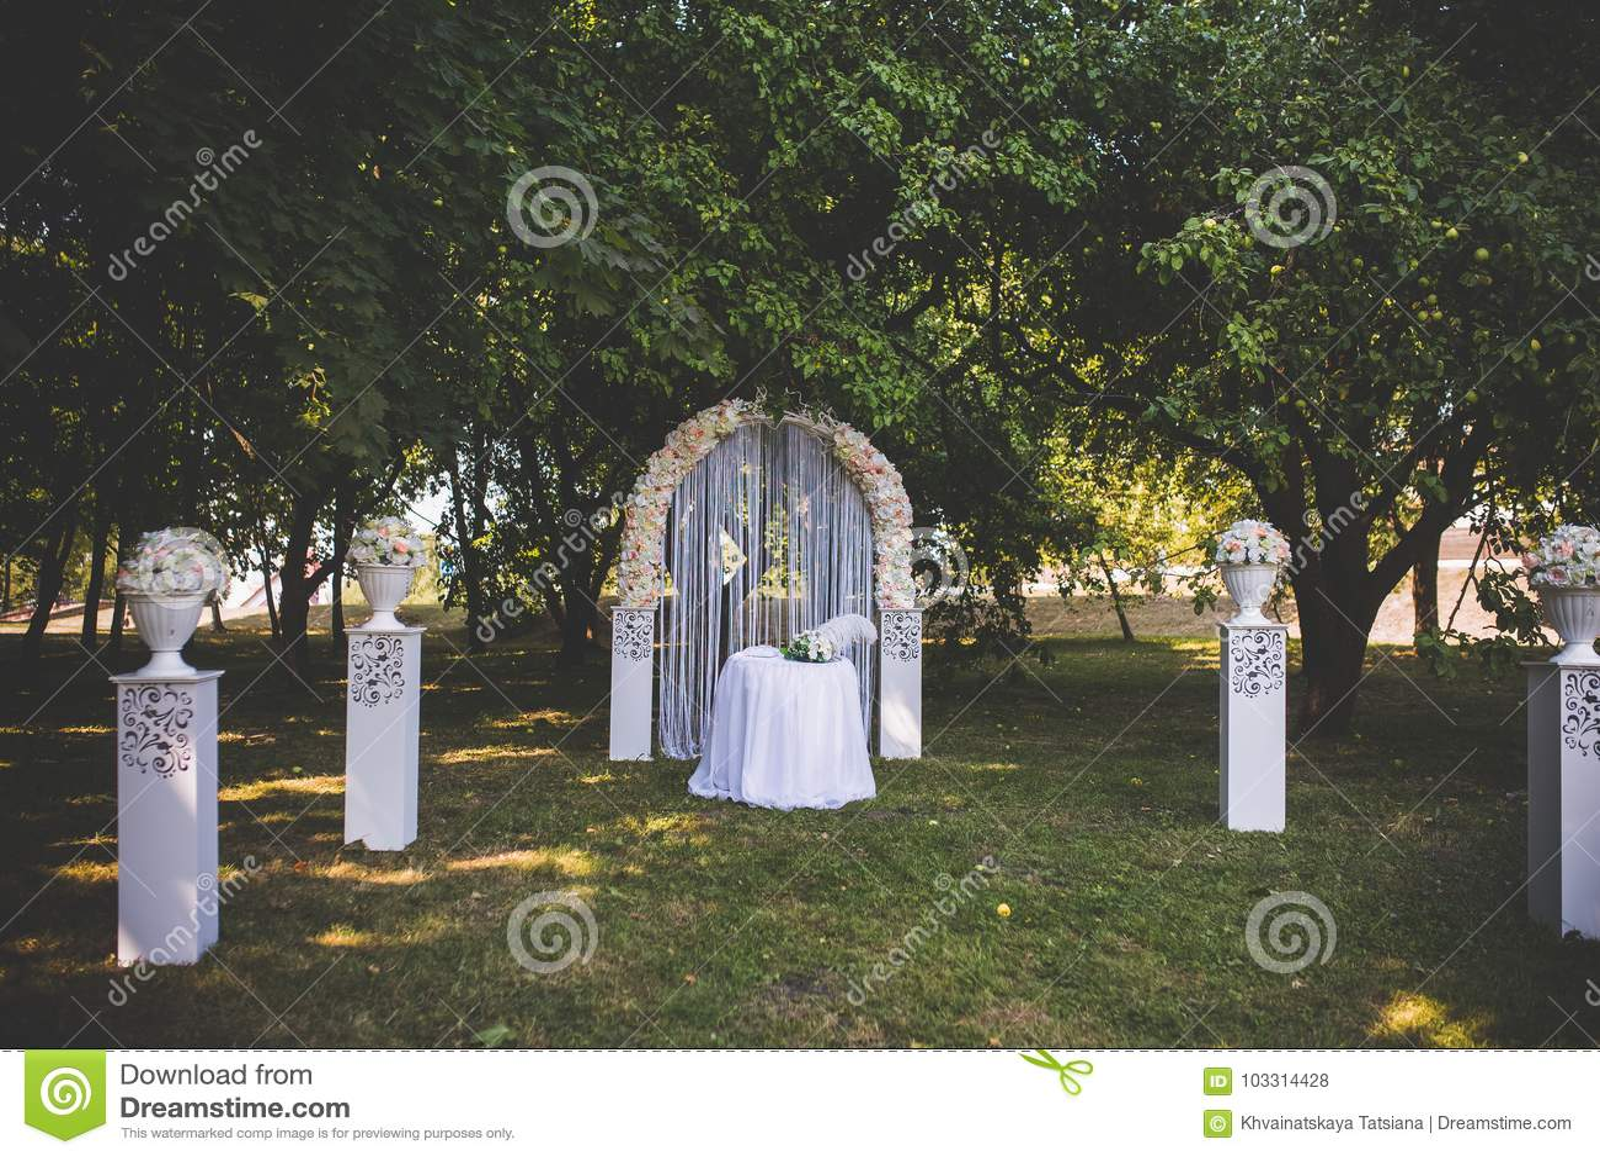 Wedding decorations flowers in a white vase table and wedding arch download wedding decorations flowers in a white vase table and wedding arch festive junglespirit Gallery